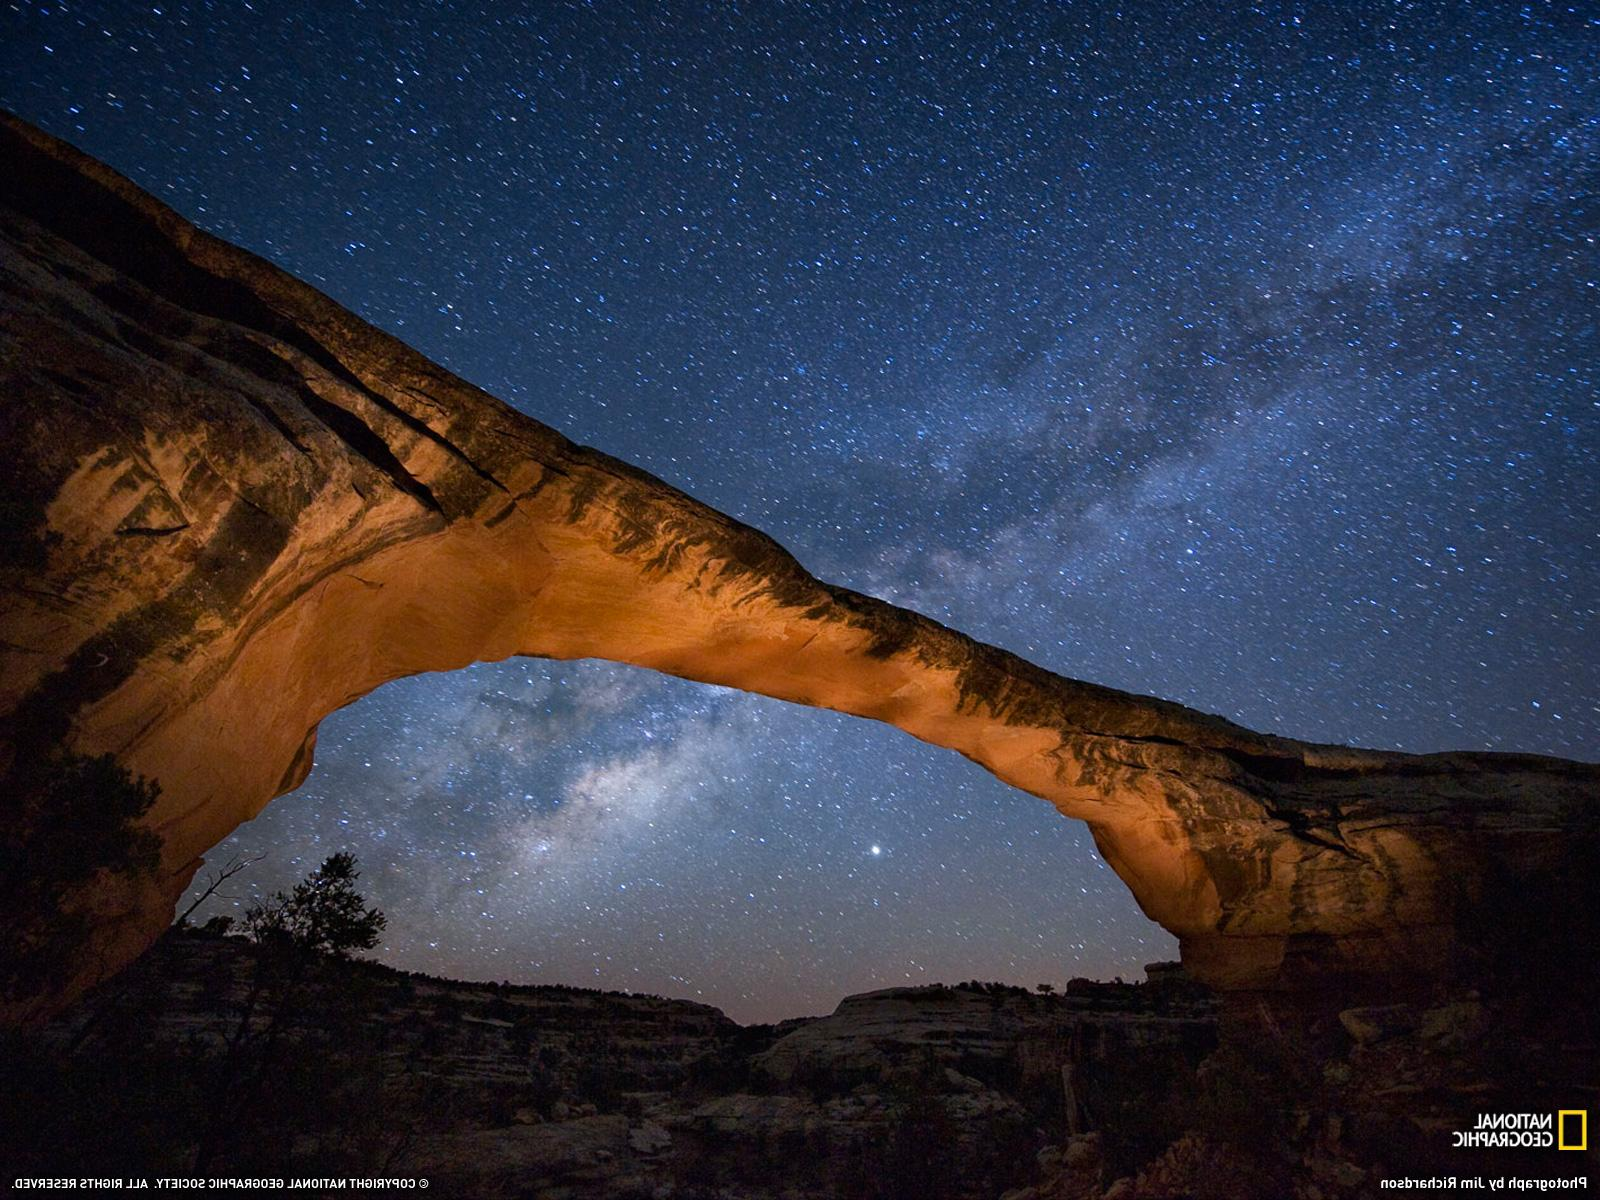 Amazing Night Sky Pics and